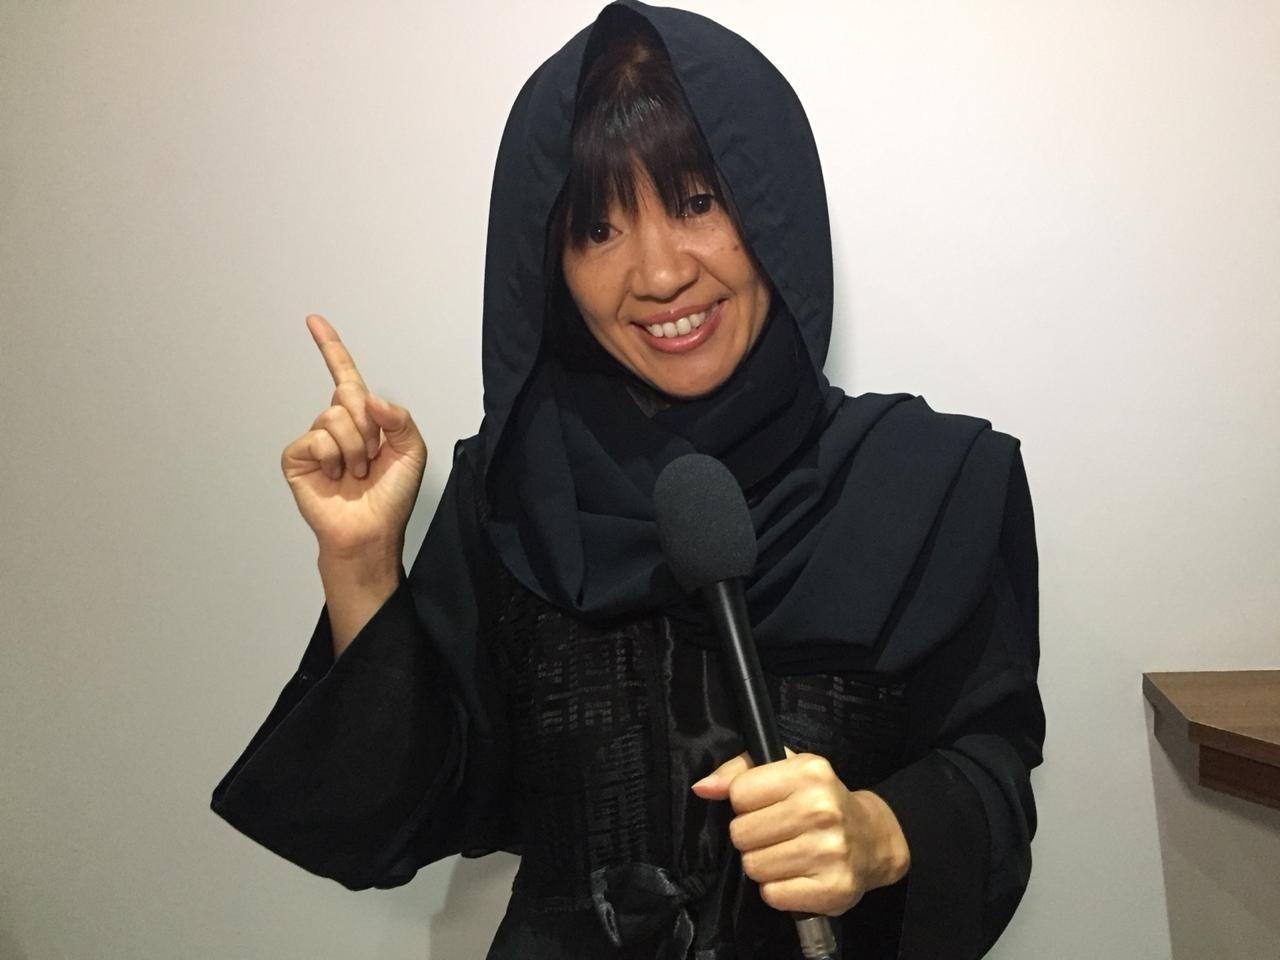 Kiyomi Nakamura jornalista japonesa seleção burca horizontal